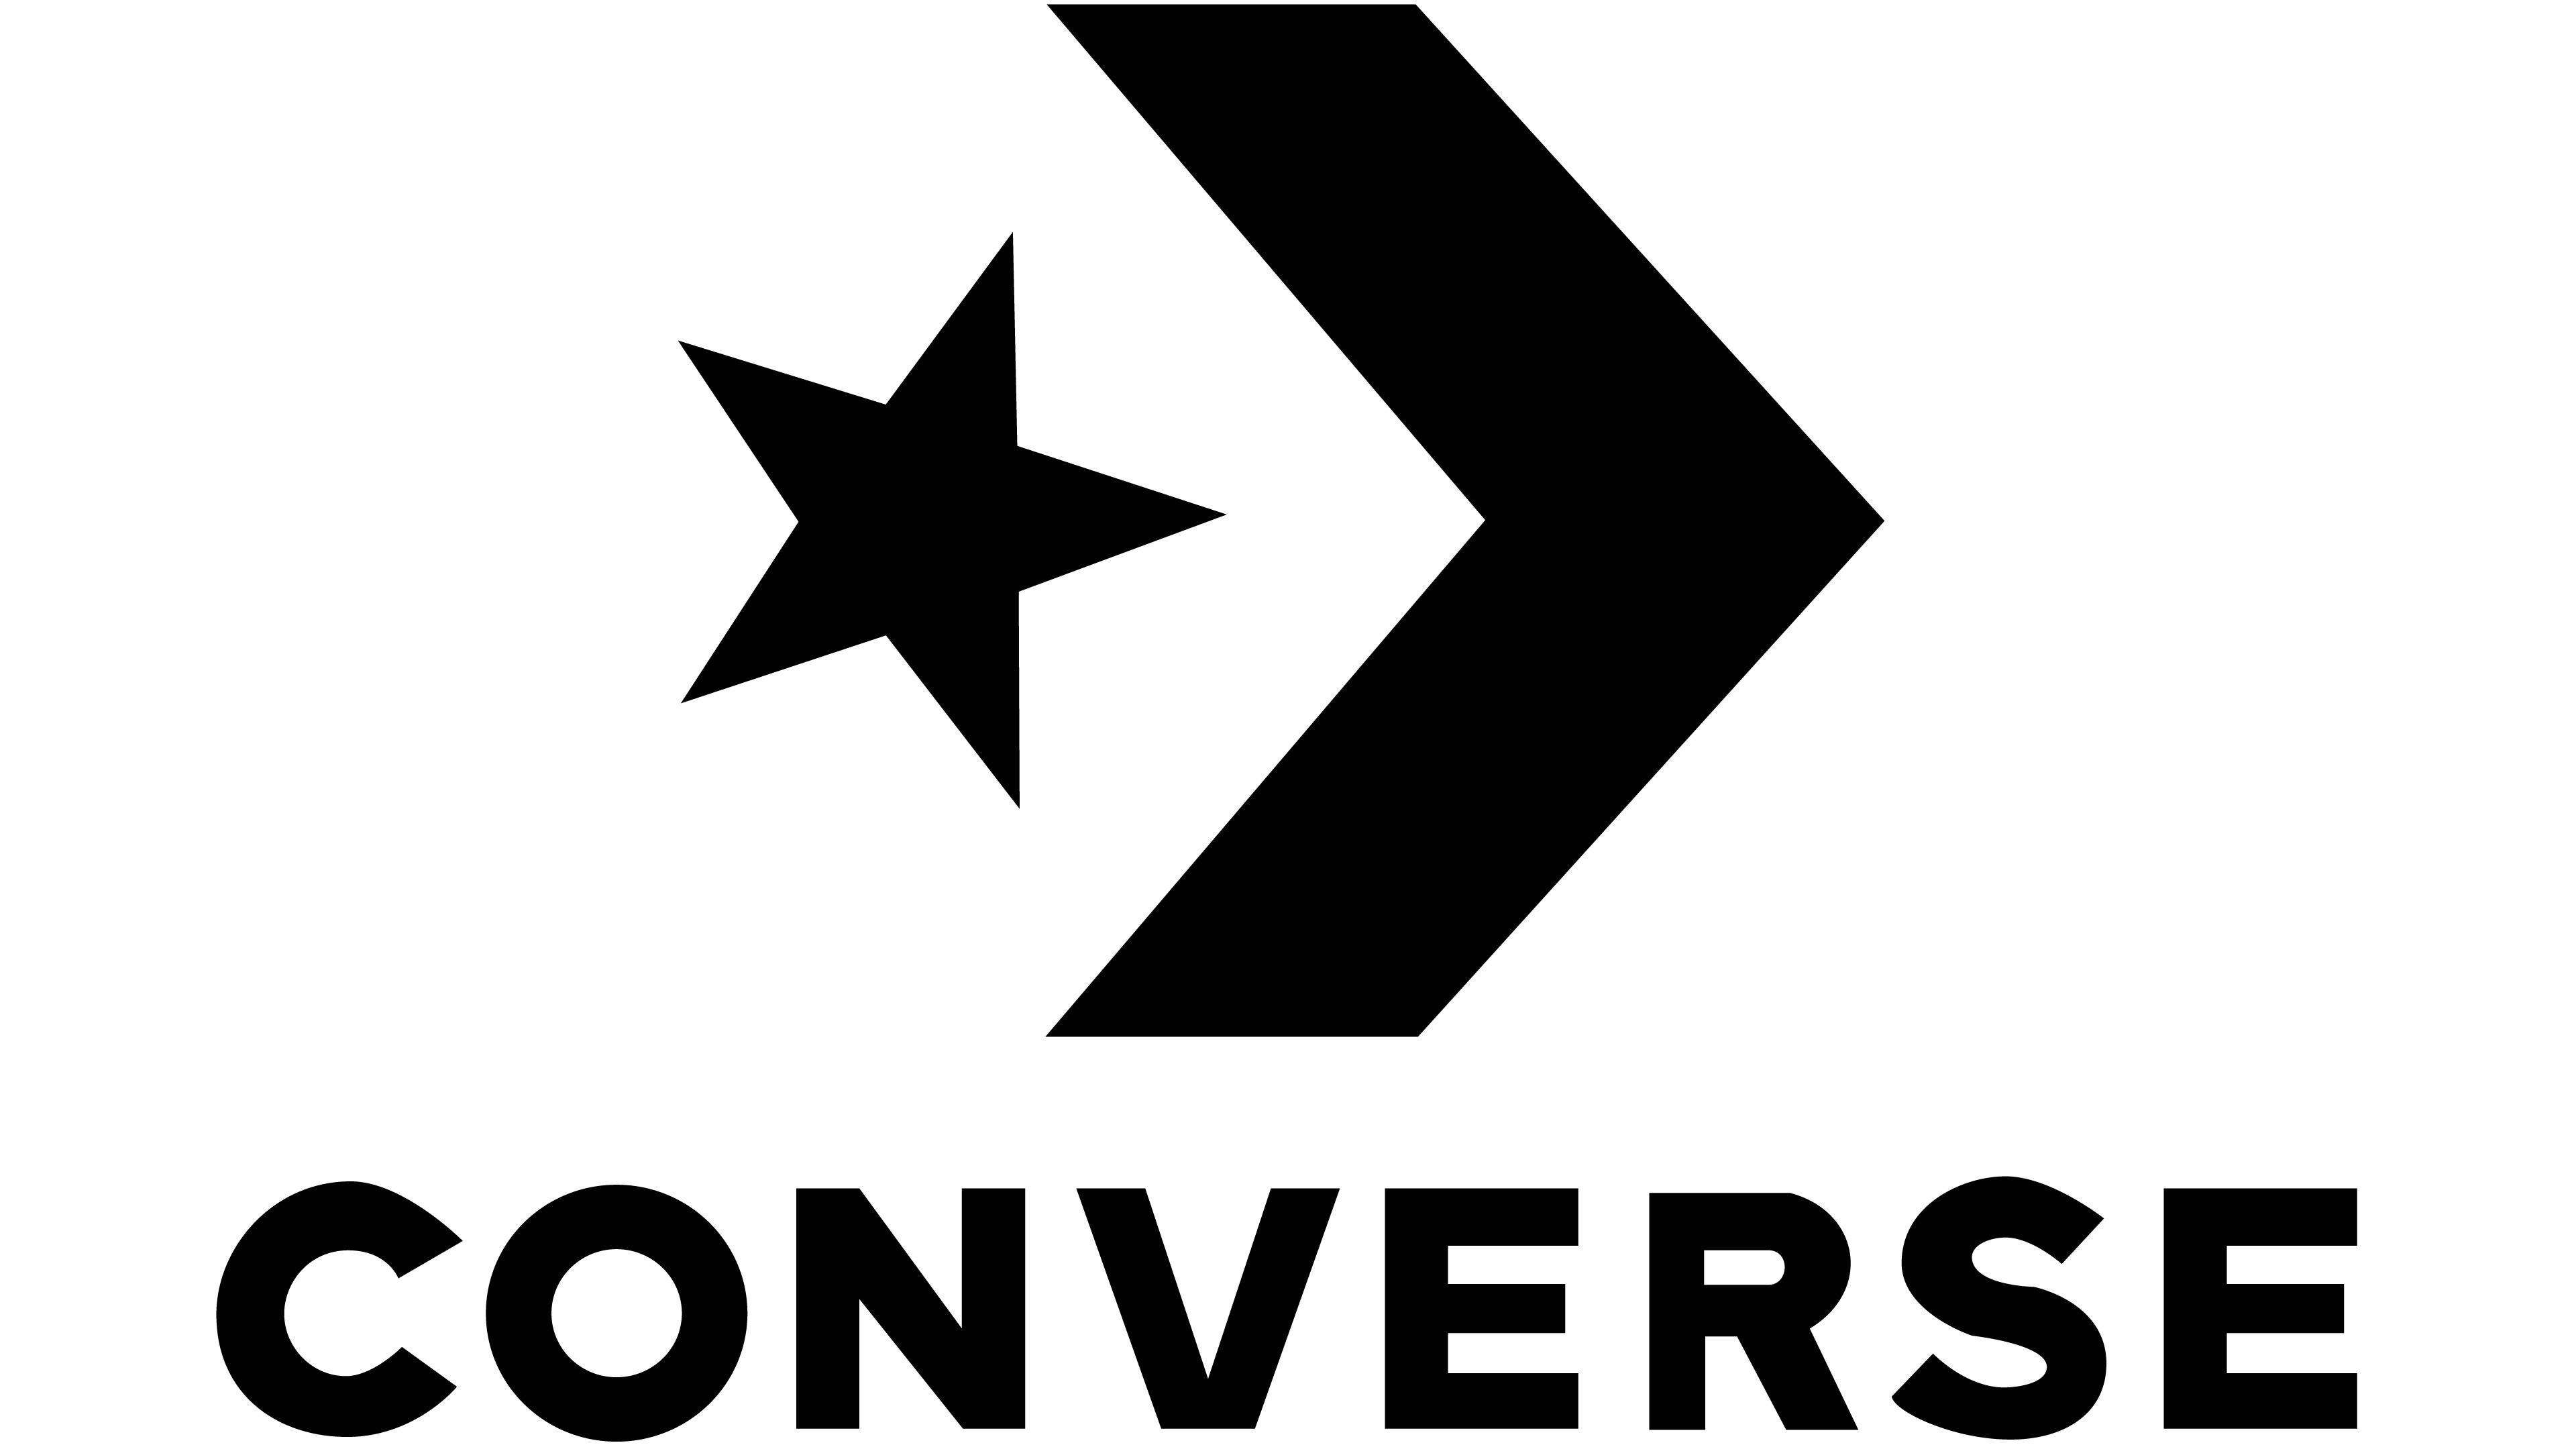 aab2a94e9ec8 File Converse-Logo.jpg - Wikimedia Commons